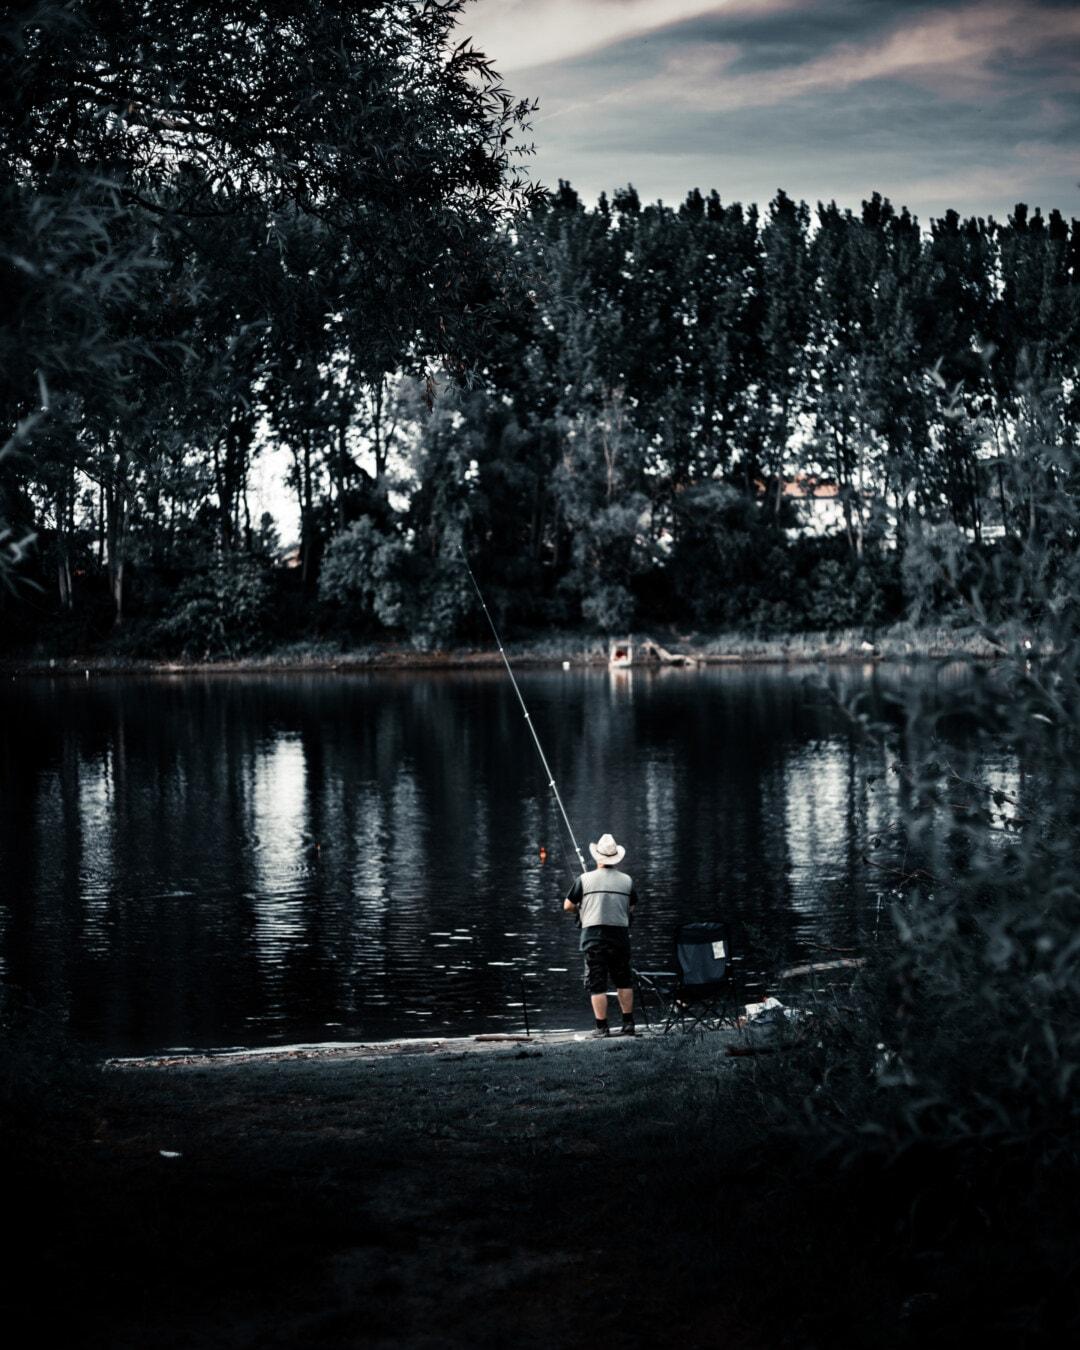 fishing, fisherman, recreation, placid, resort area, landscape, water, lake, reflection, monochrome